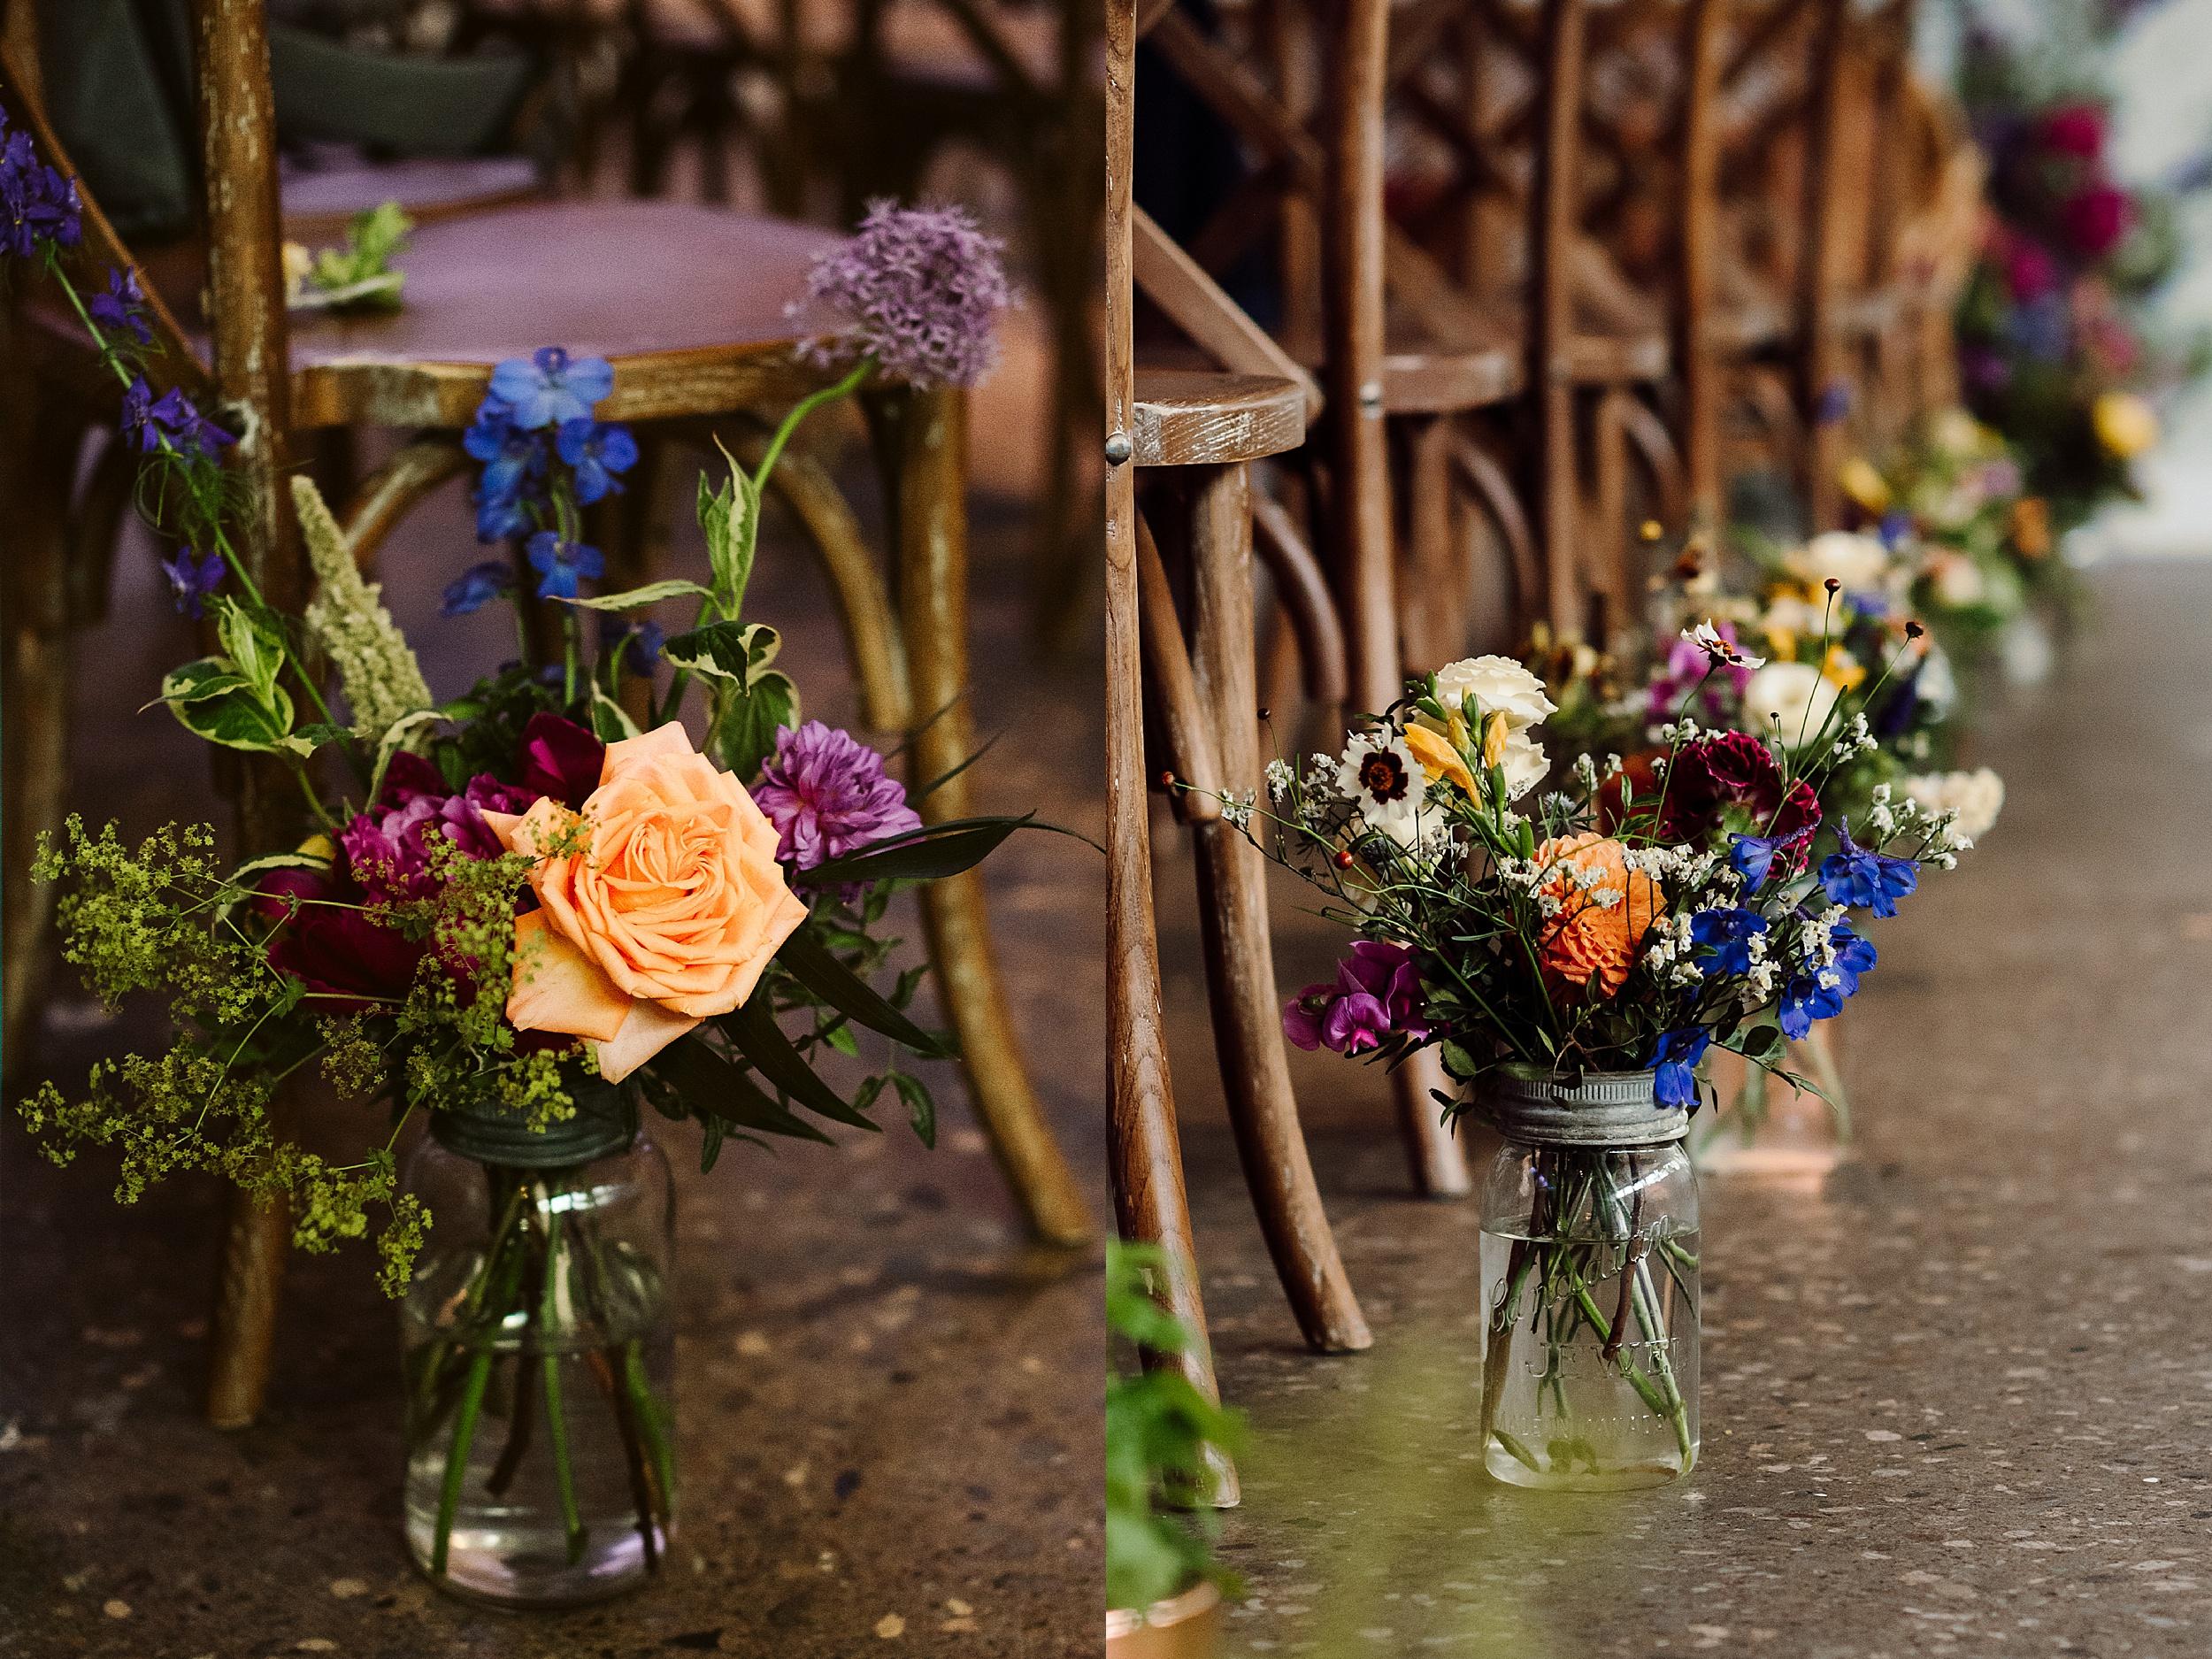 Airship-37-Berkeley-Events-Distillery-District-Wedding-Toronto-Wedding-Photographers_0057.jpg